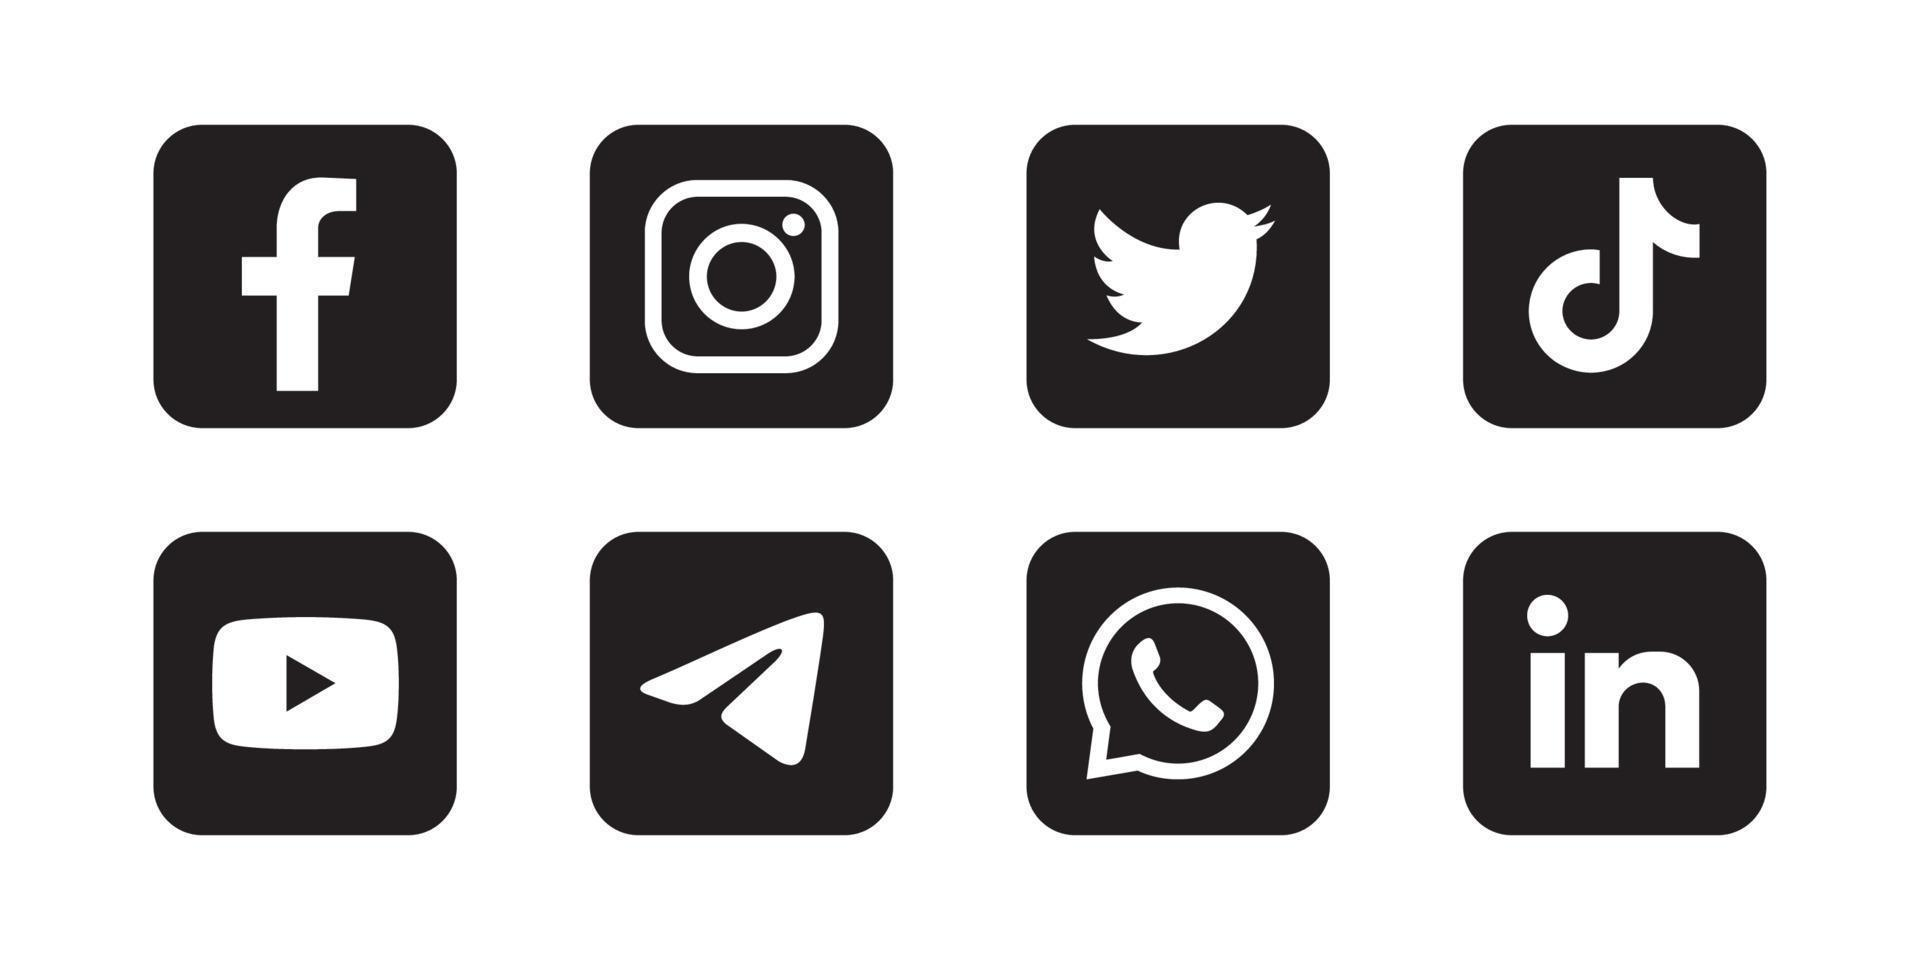 Set of social media icon in black background vector